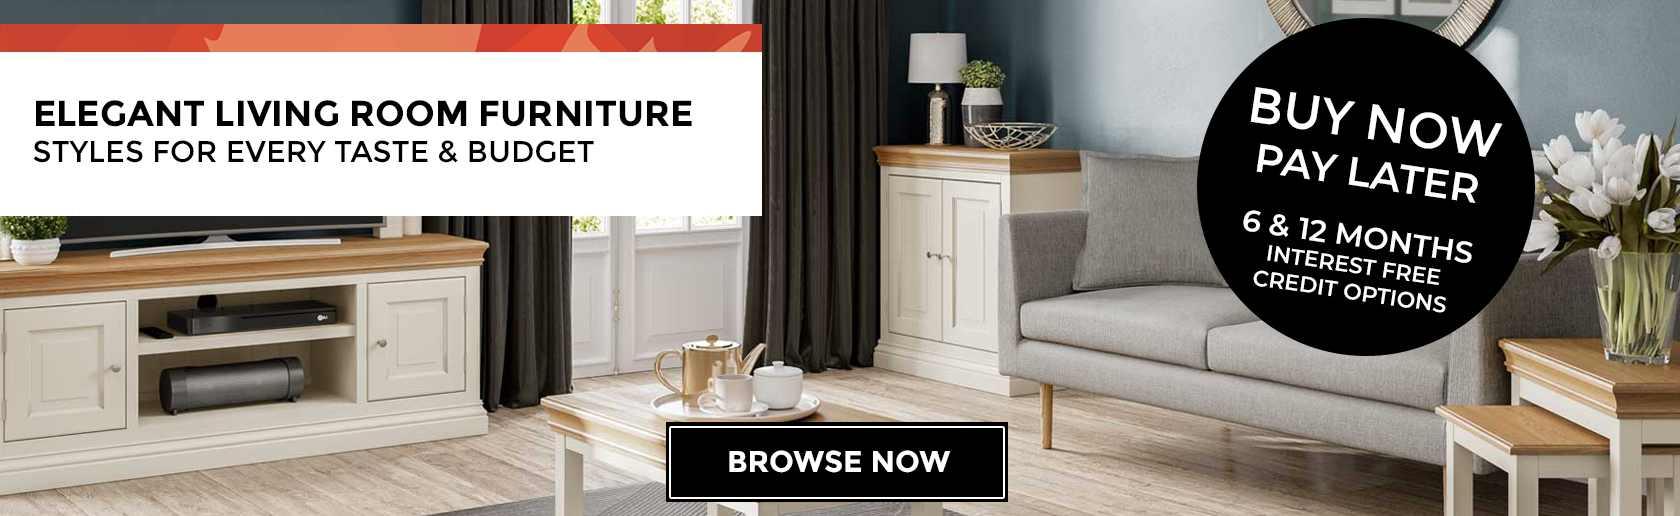 Elegant Indoor Living